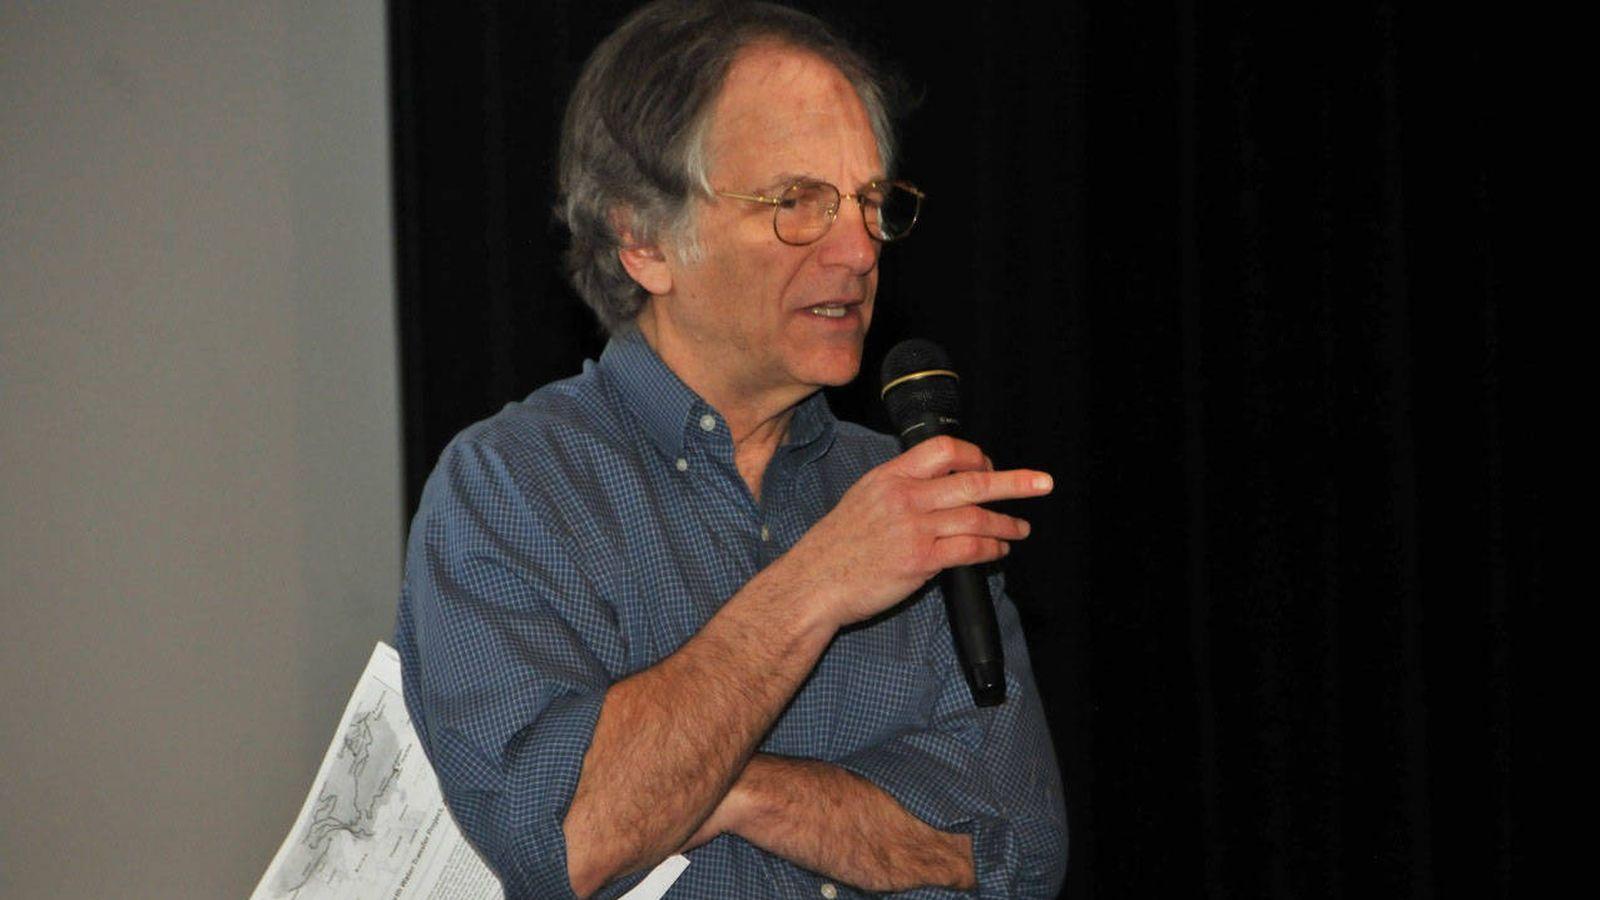 Foto: Len Adleman creó junto a otros dos investigadores el popular algoritmo RSA (Len Adleman)